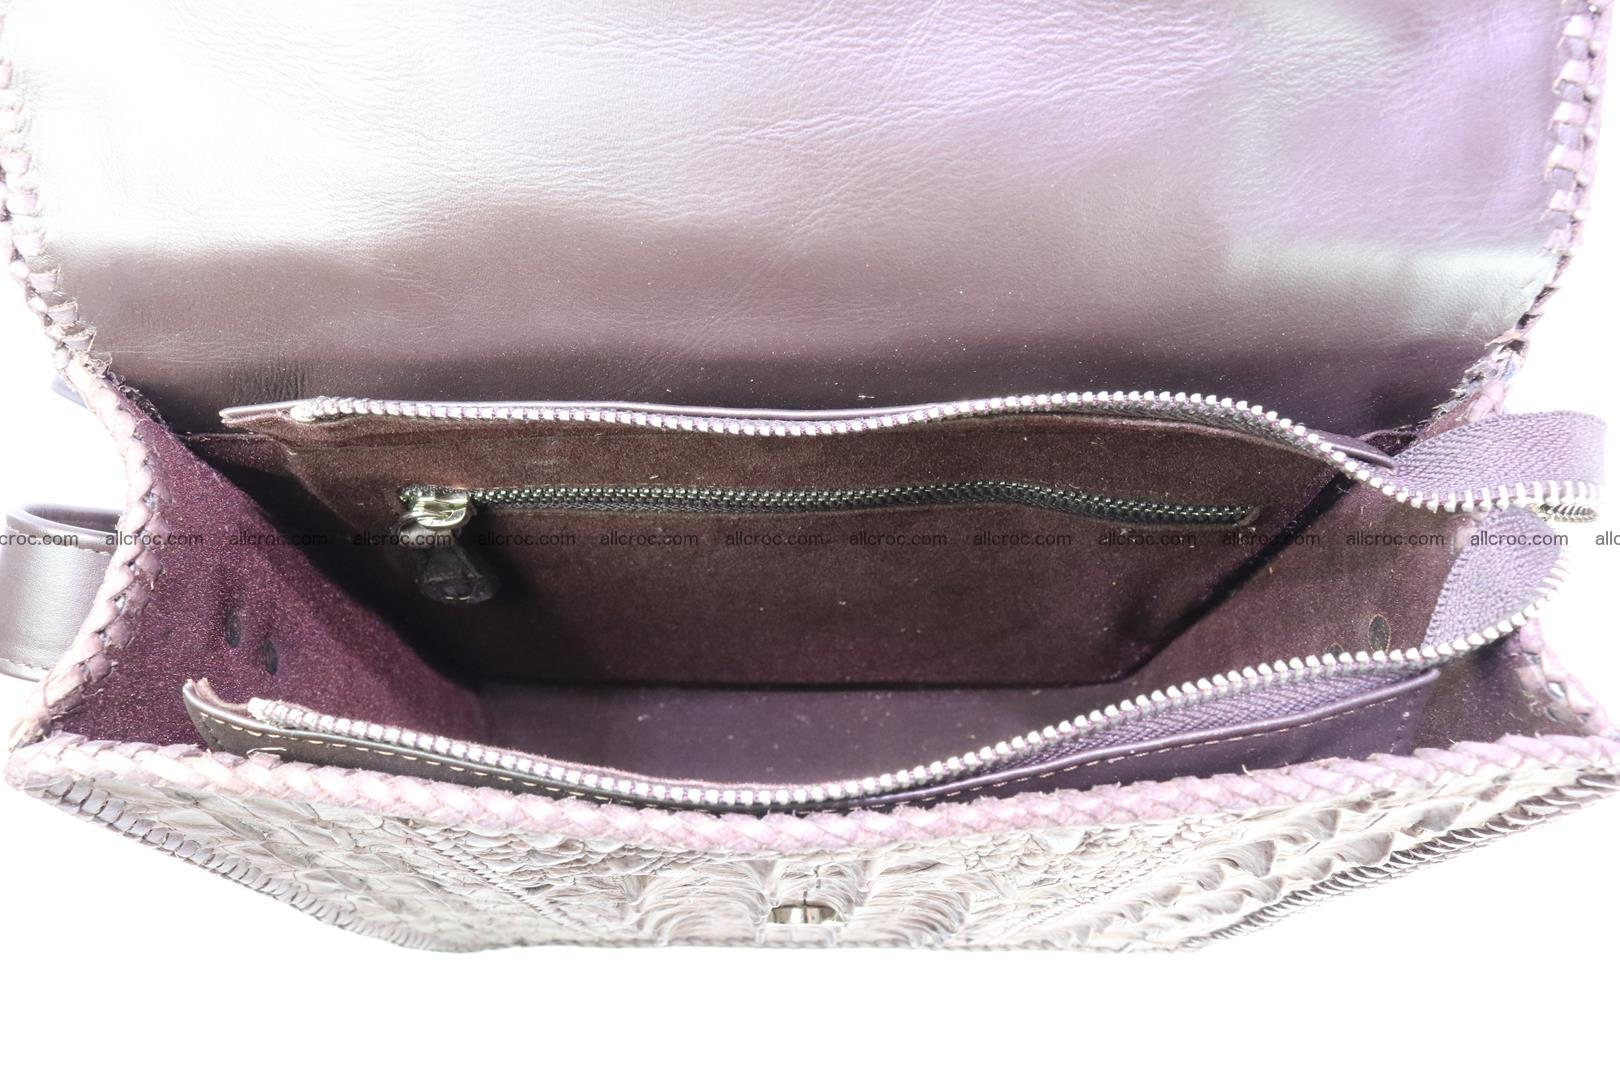 Сrocodile skin shoulder bag with braided edges 142 Foto 13